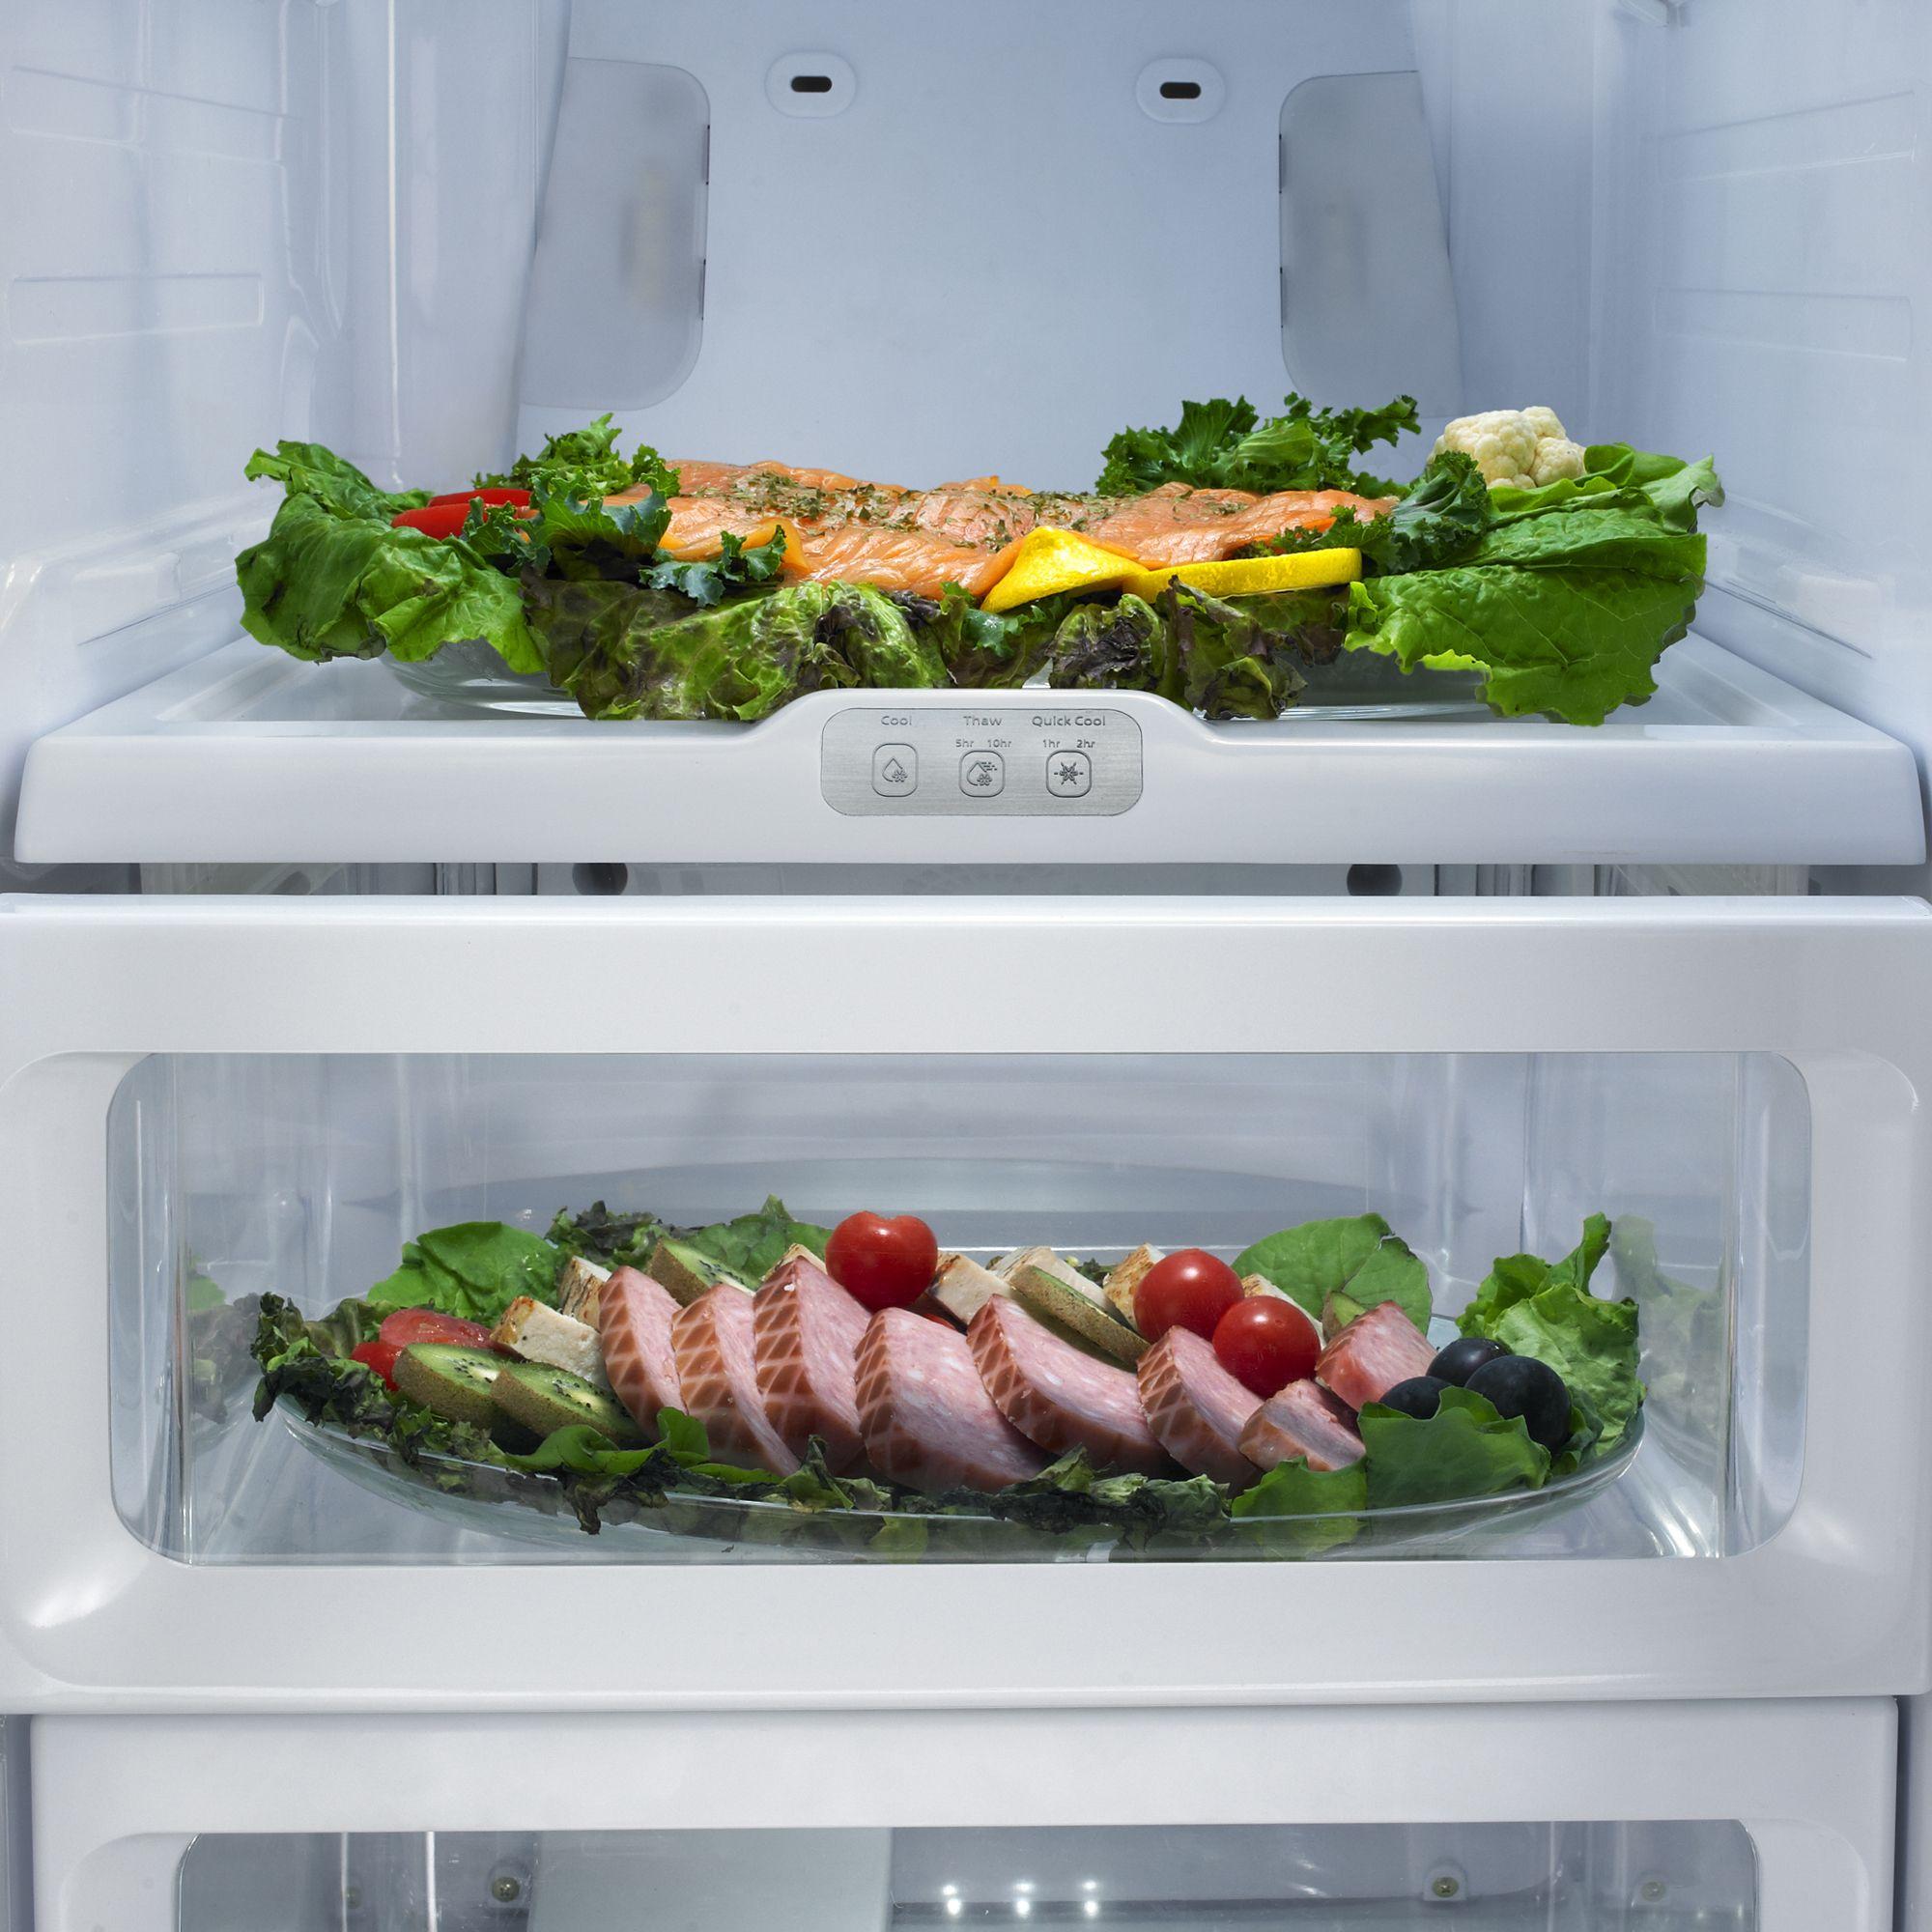 Samsung 25.5 cu. ft. Side-by-Side Refrigerator-Black